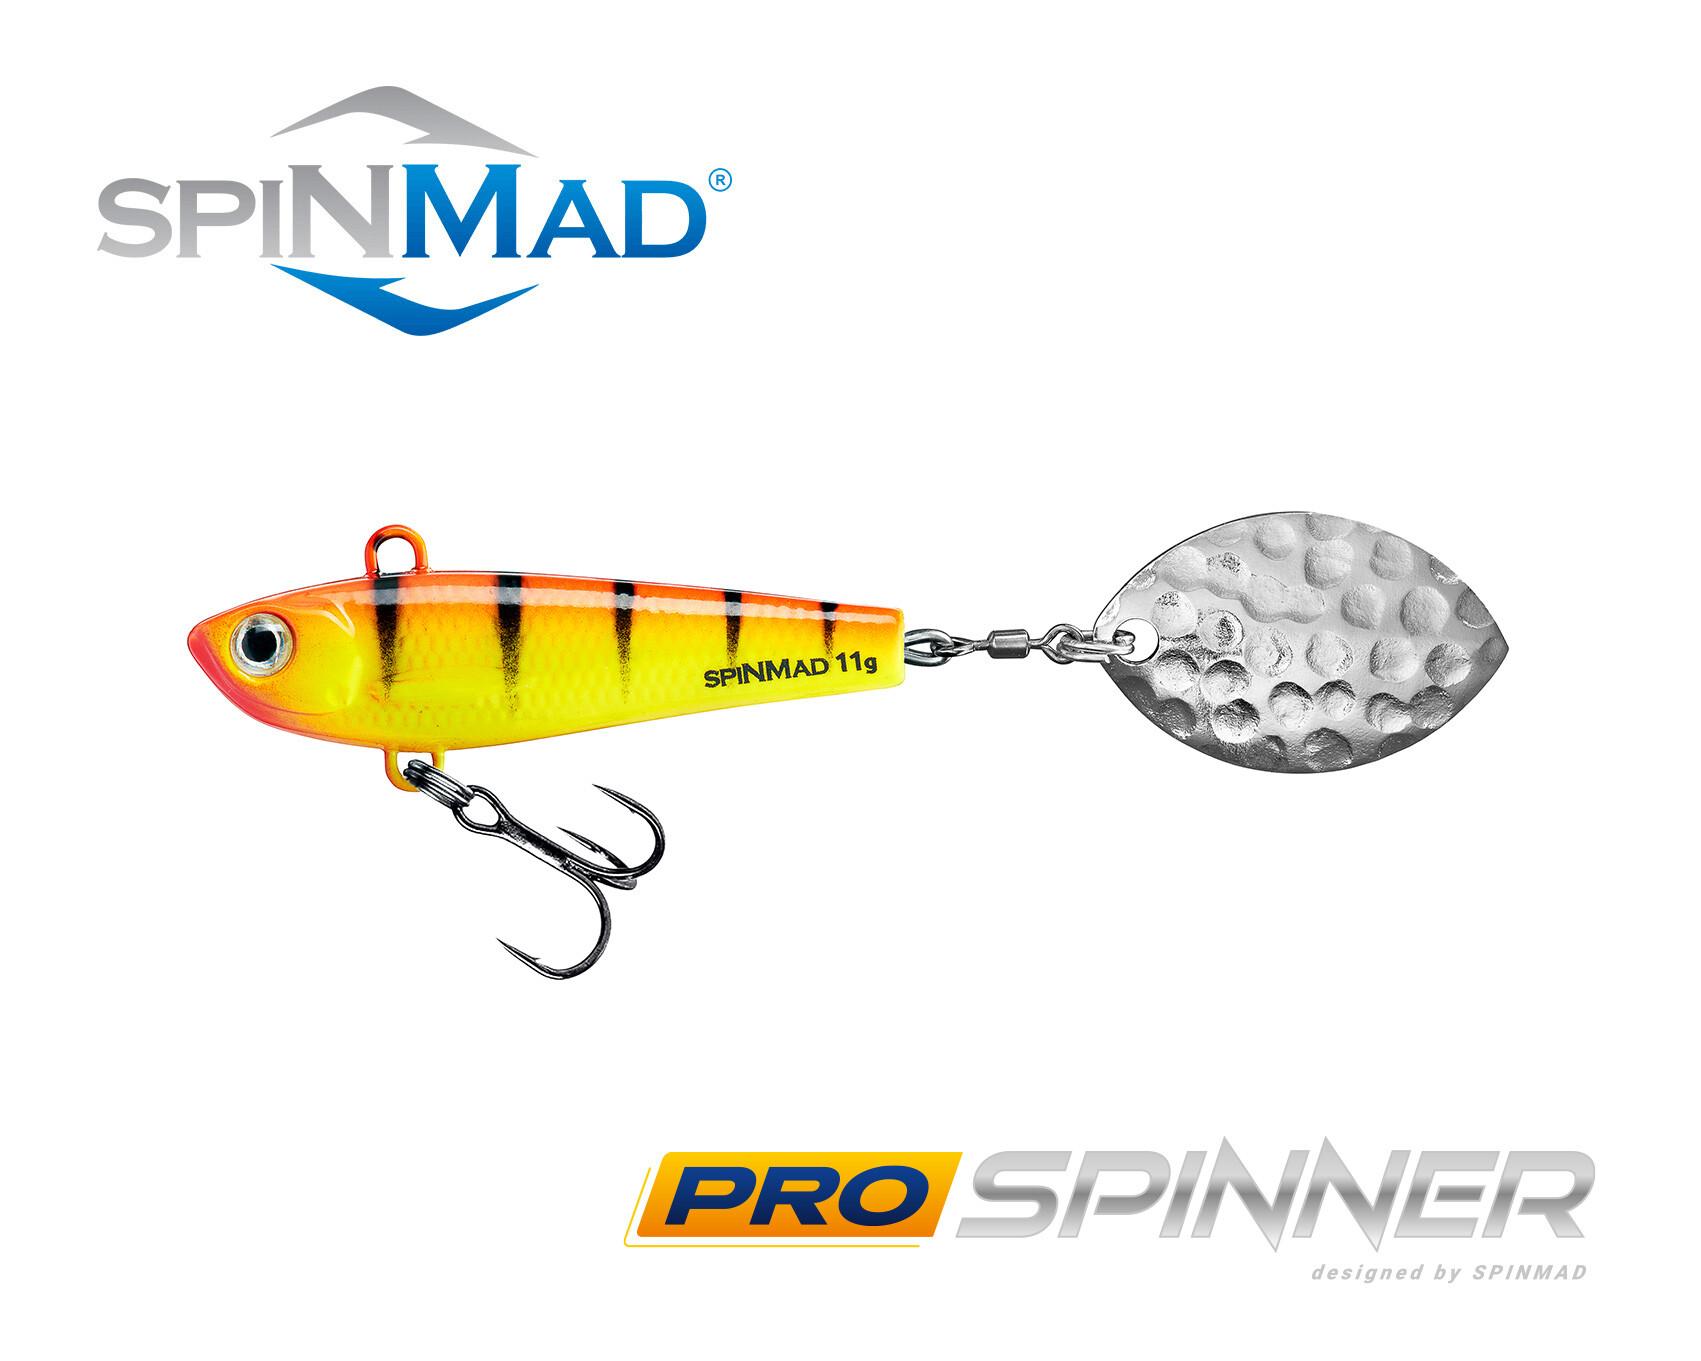 Spinmad Pro Spinner 11G Hero